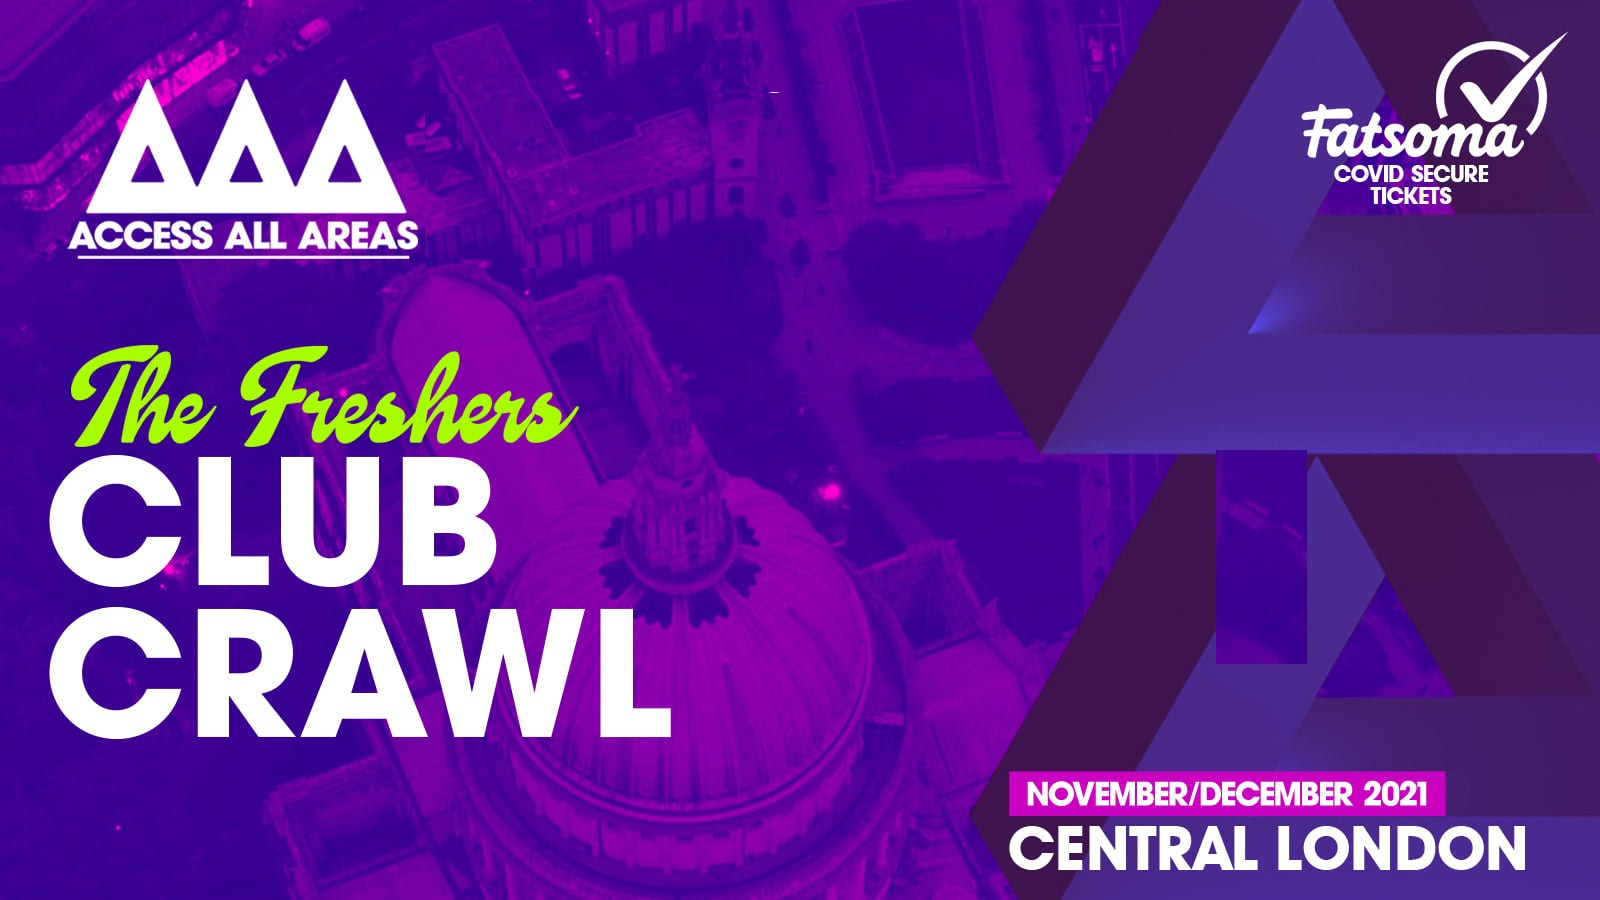 The Friday Night Freshers Club Crawl 🍻 November 5th 2021 💥